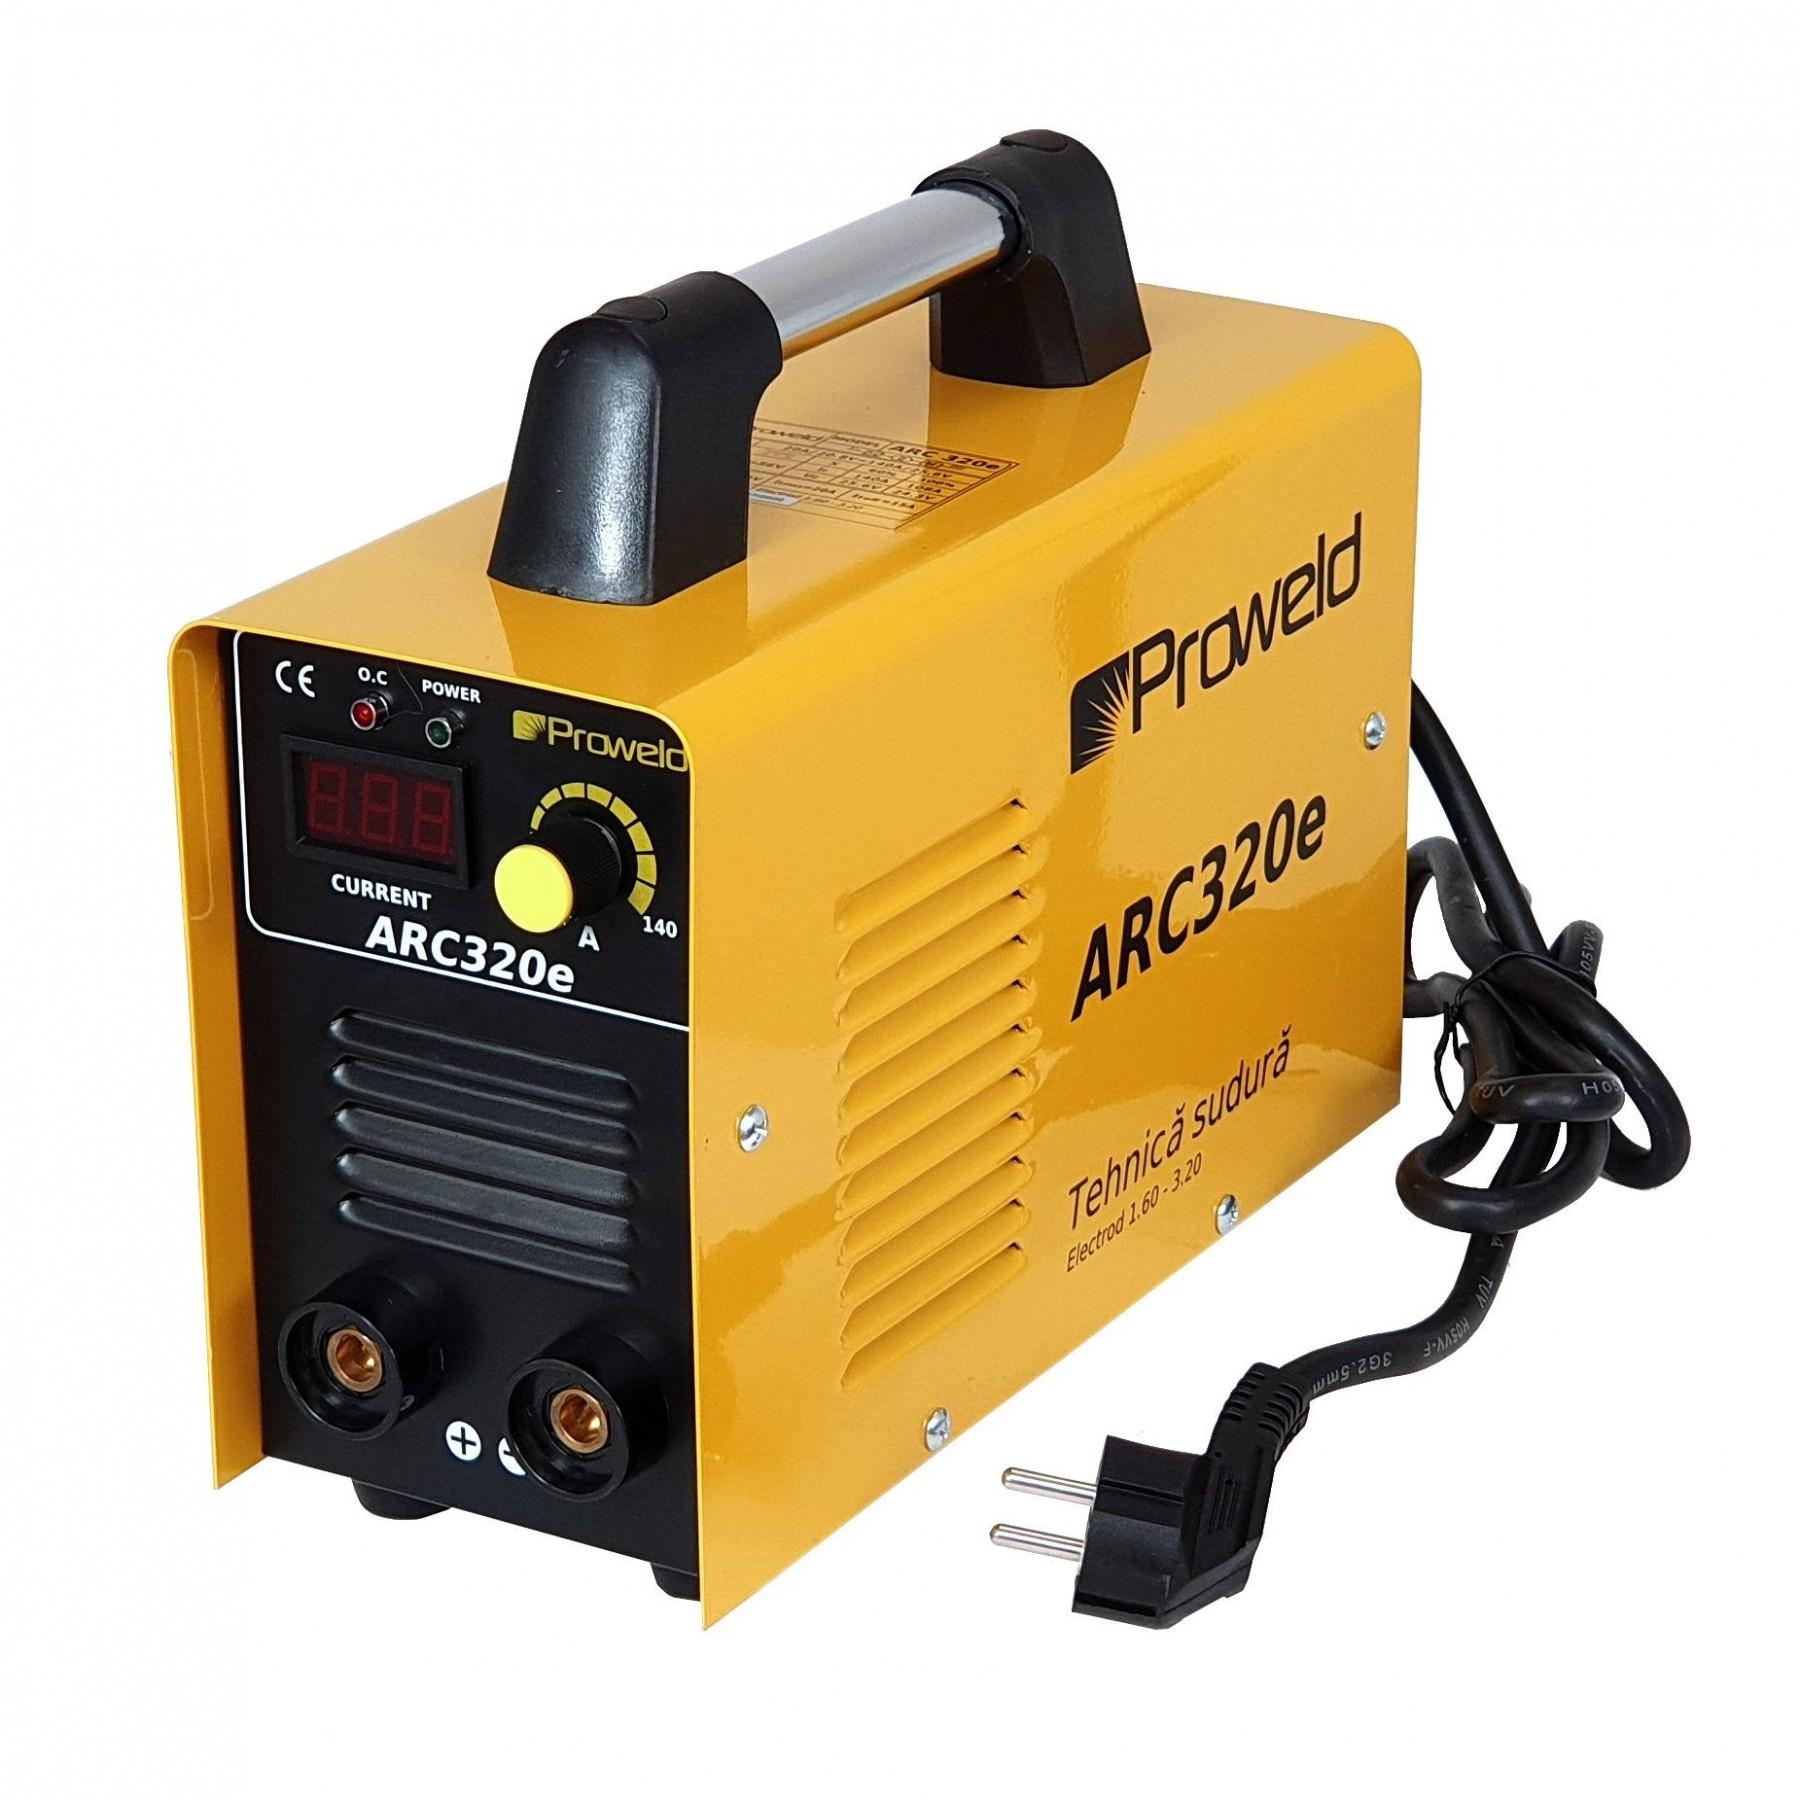 Invertor de sudura ProWELD ARC320e, 230 V, 20-140 A, electrod max. 3.2 mm, valiza transport